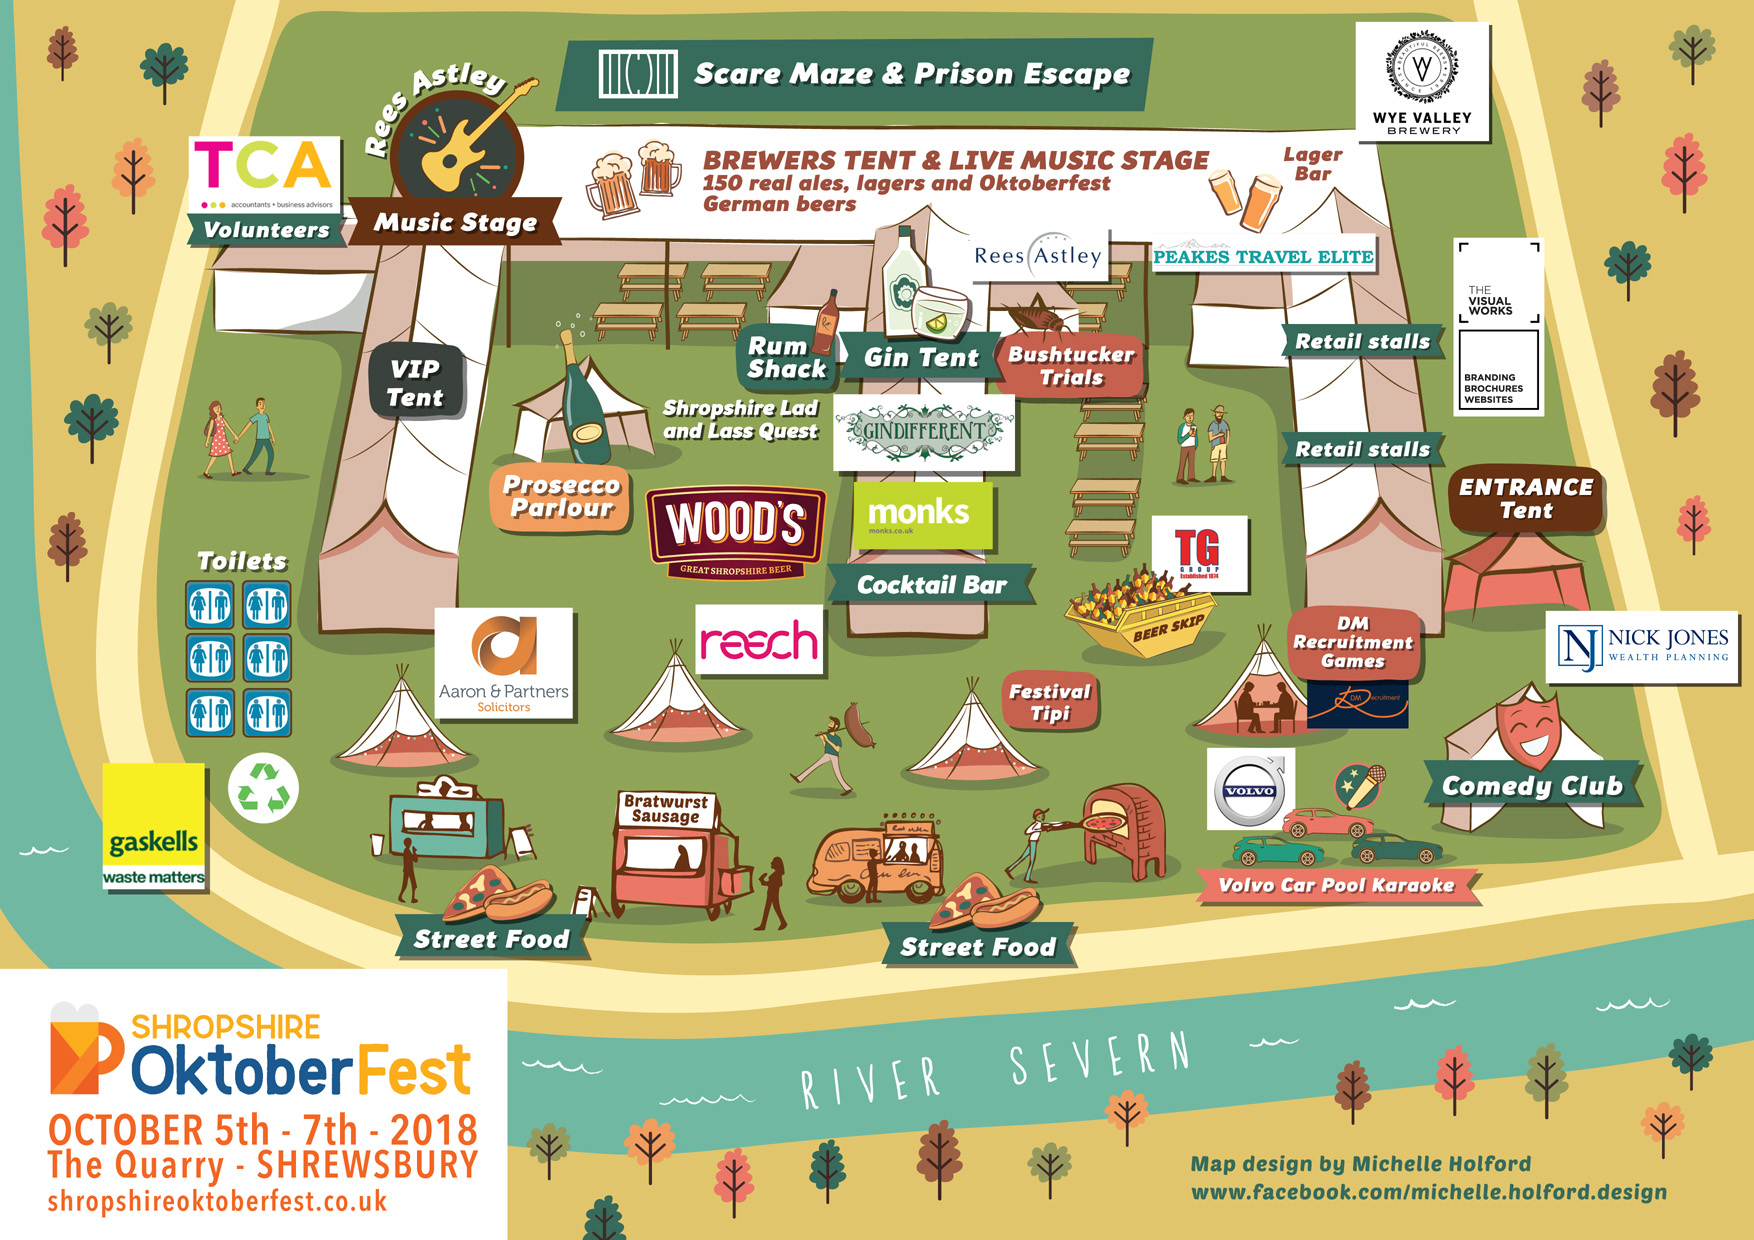 Shropshire oktoberfest map 2018